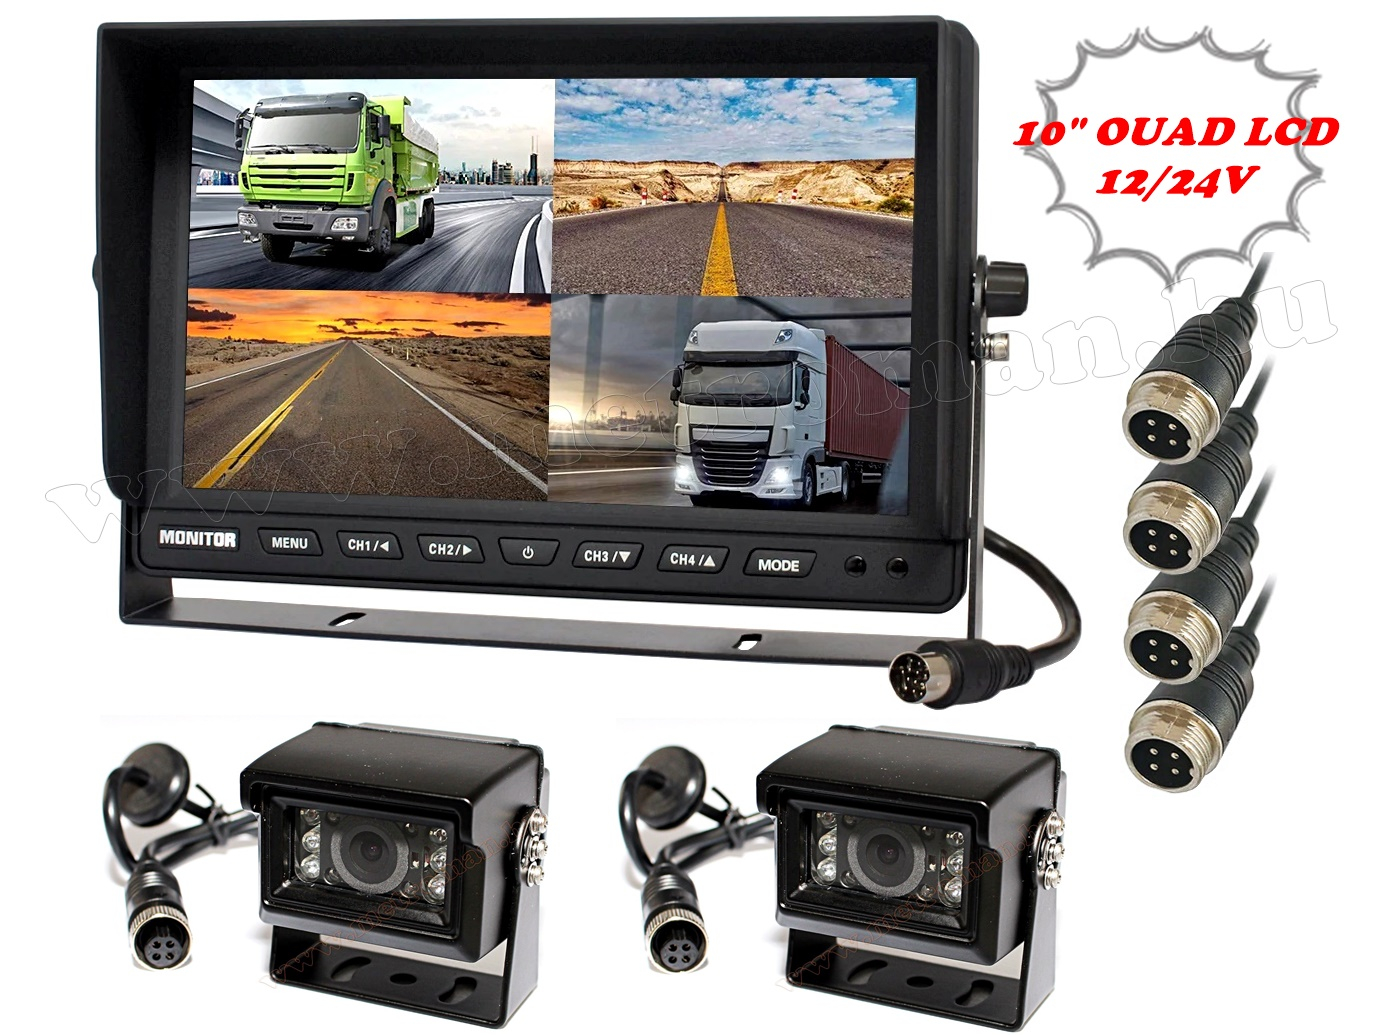 "Kamion, teherautó, targonca, munkagép ipari 2 kamerás tolatókamera szett 10"" LCD QUAD LCD monitorral MM1000-QUAD-MT554X2"